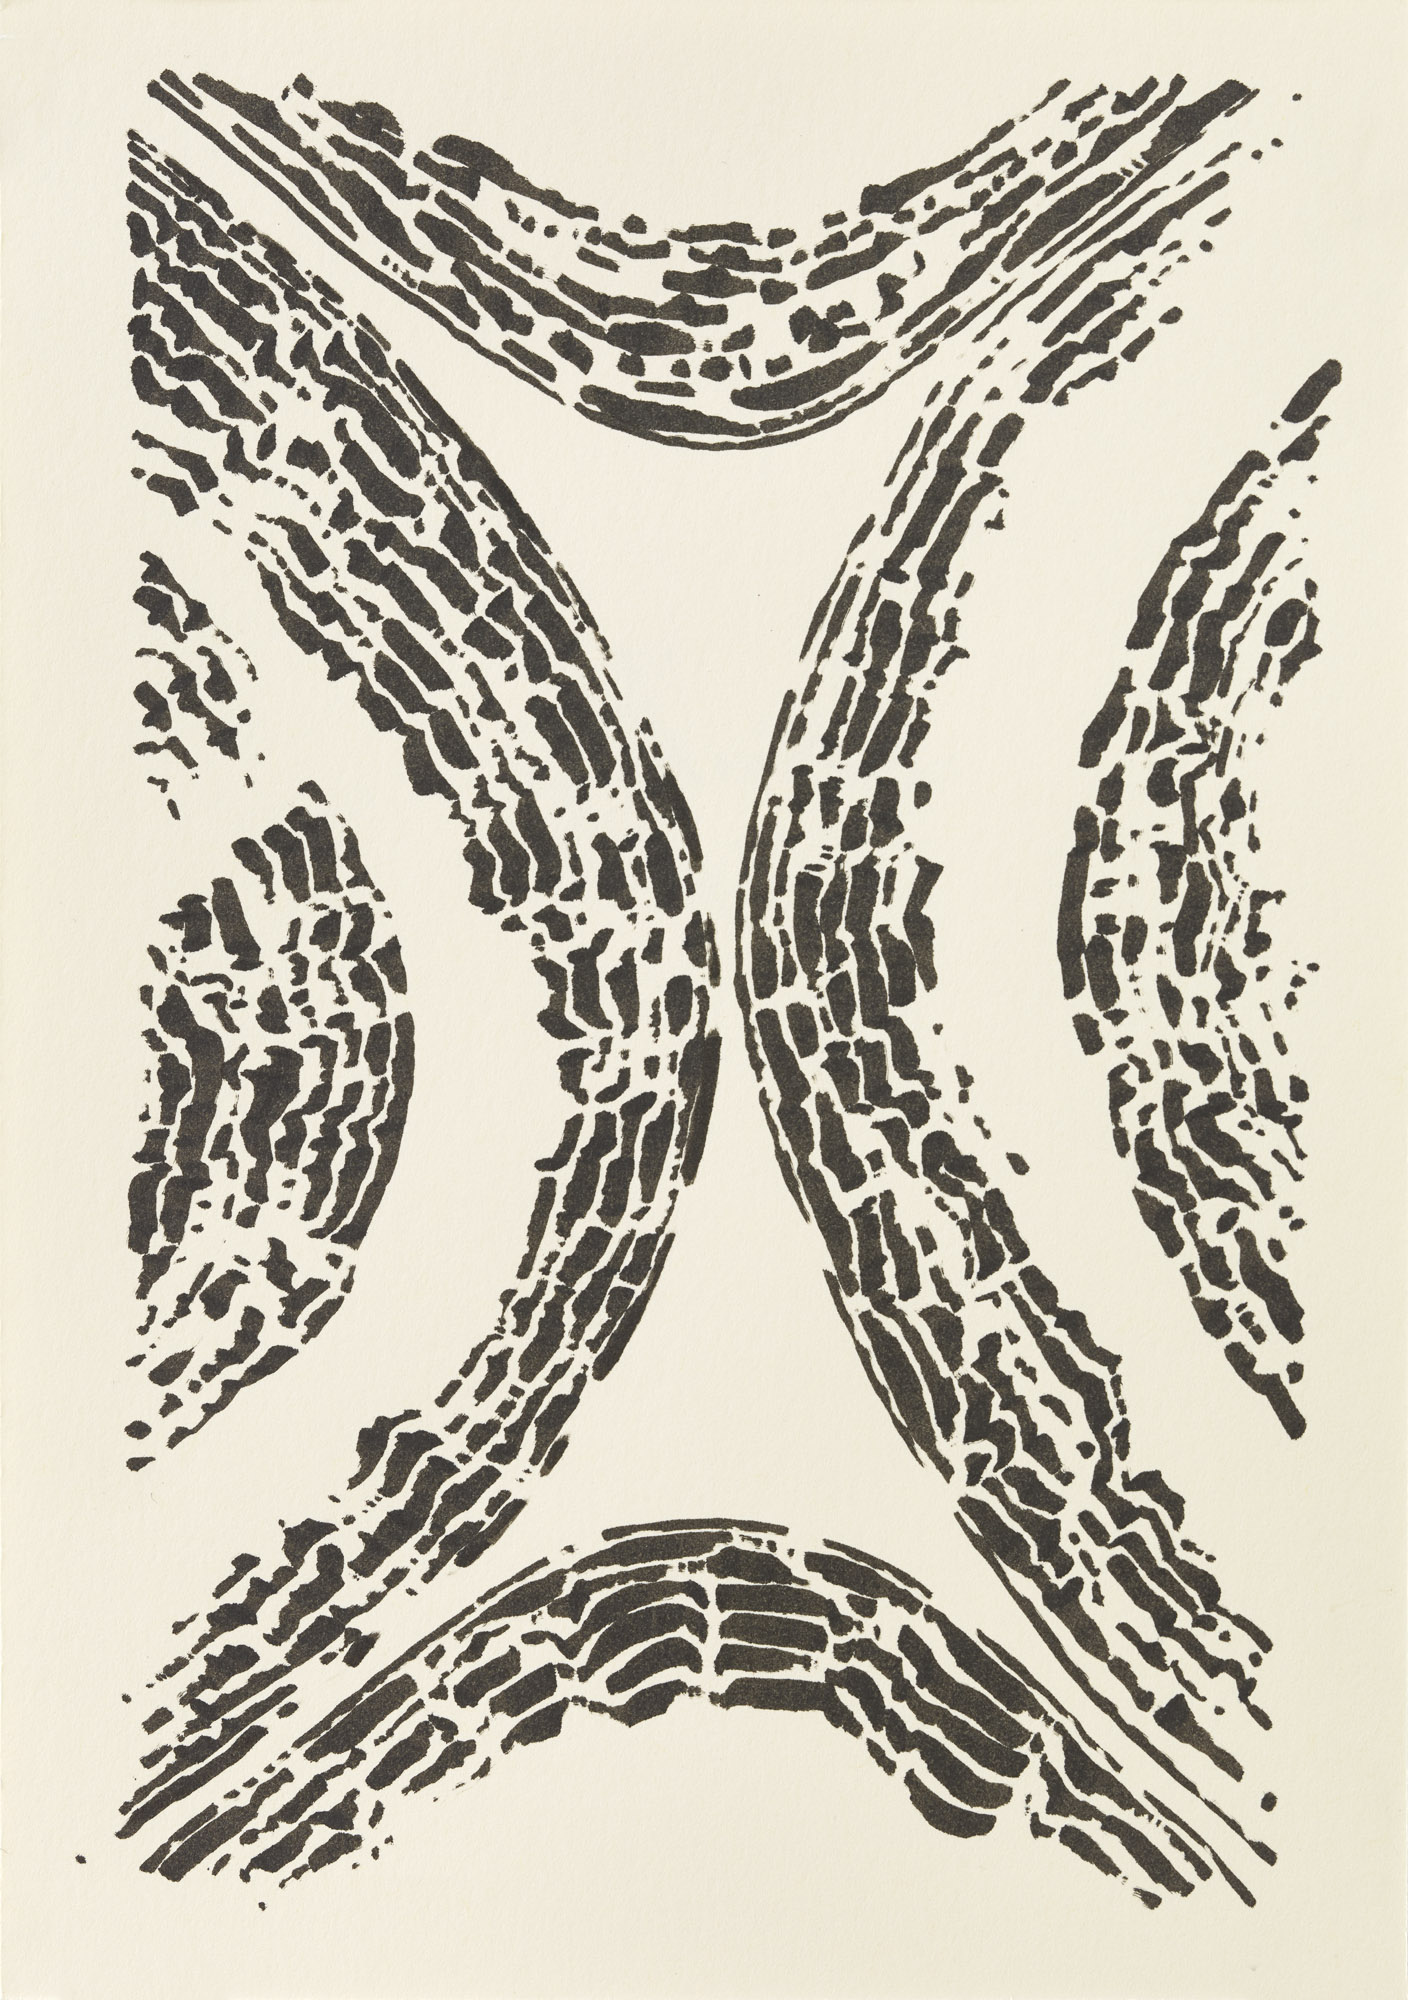 BK P7536 | untitled | ink on paper | 21x15cm | 2015